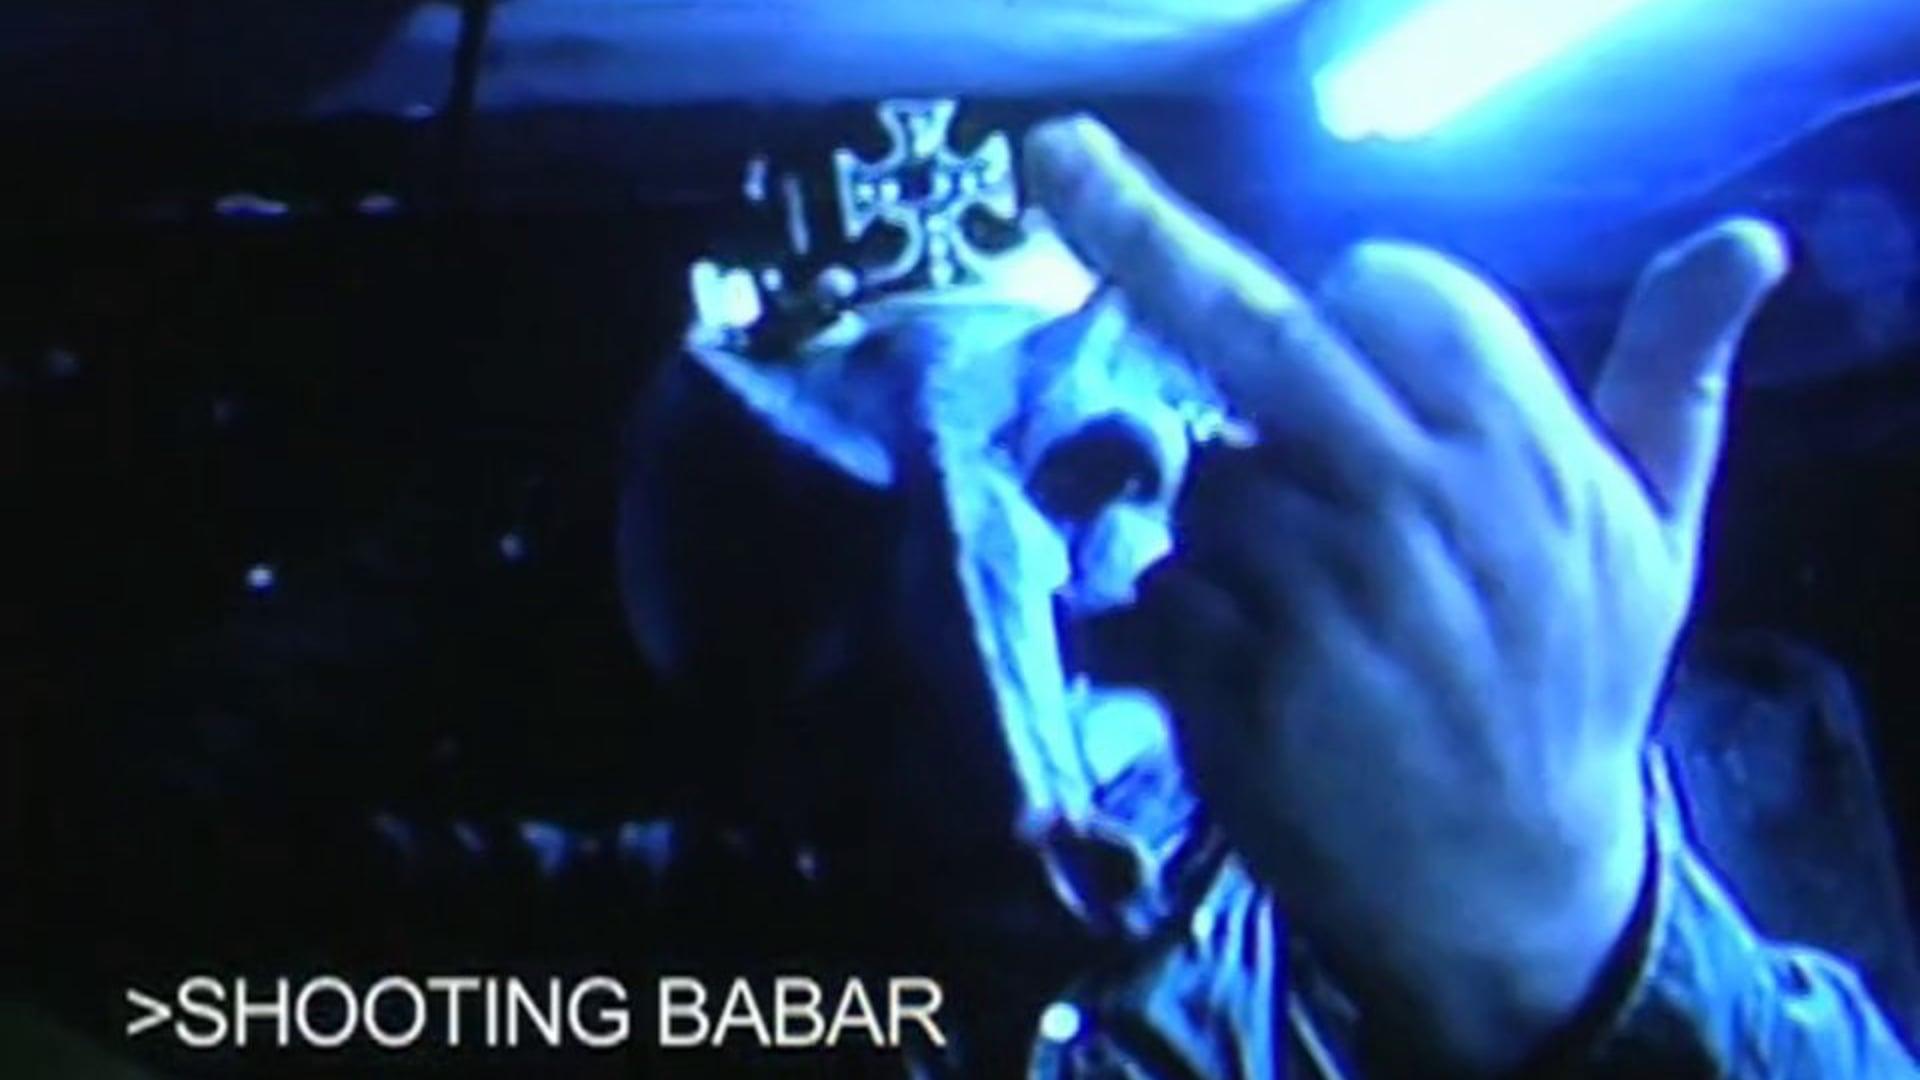 Shooting Babar